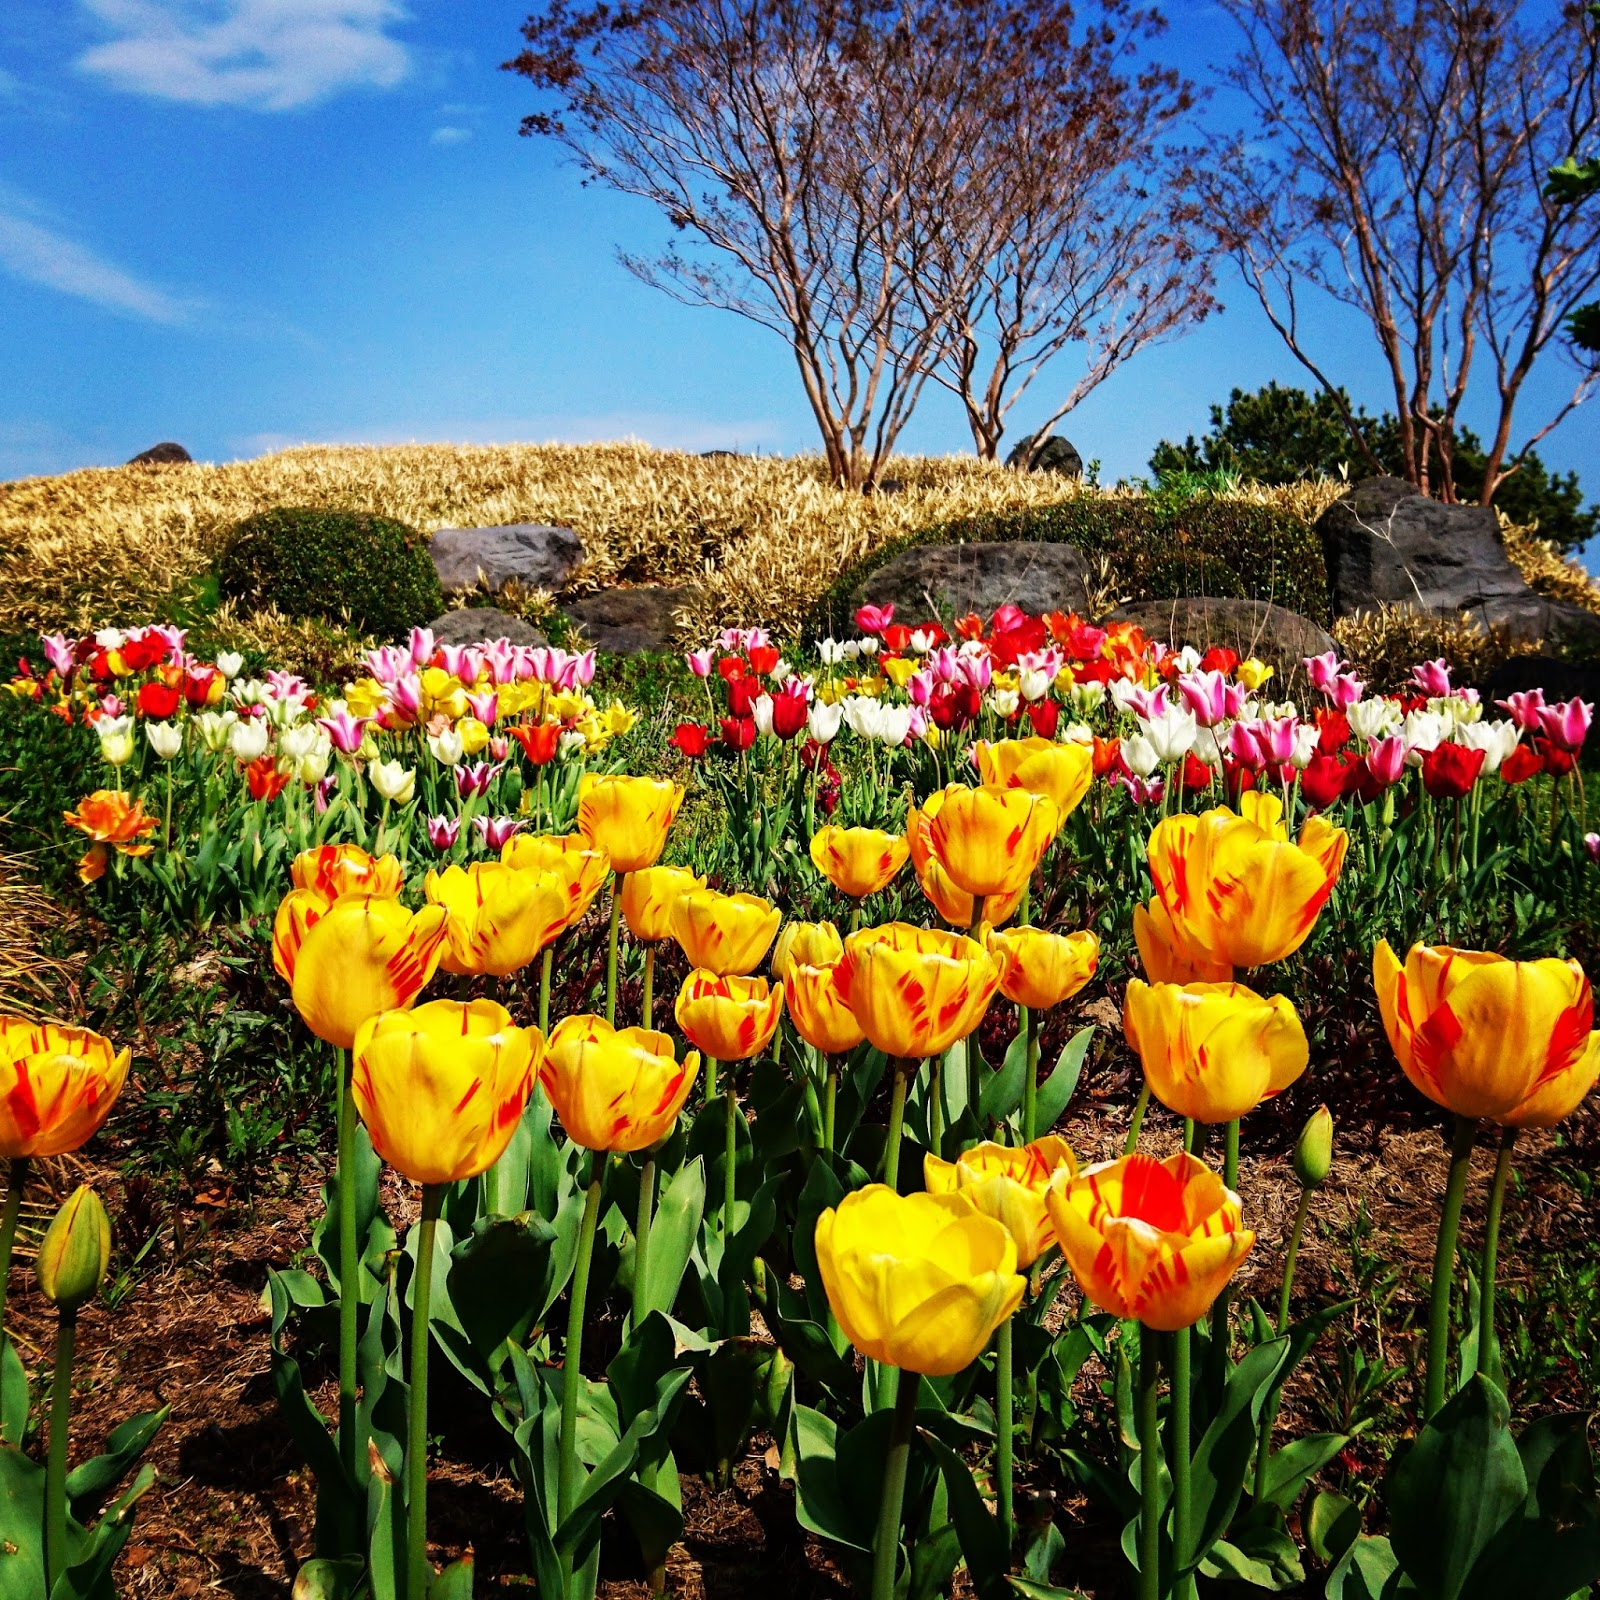 Adnilem 39 s journey tulip season for What season are tulips